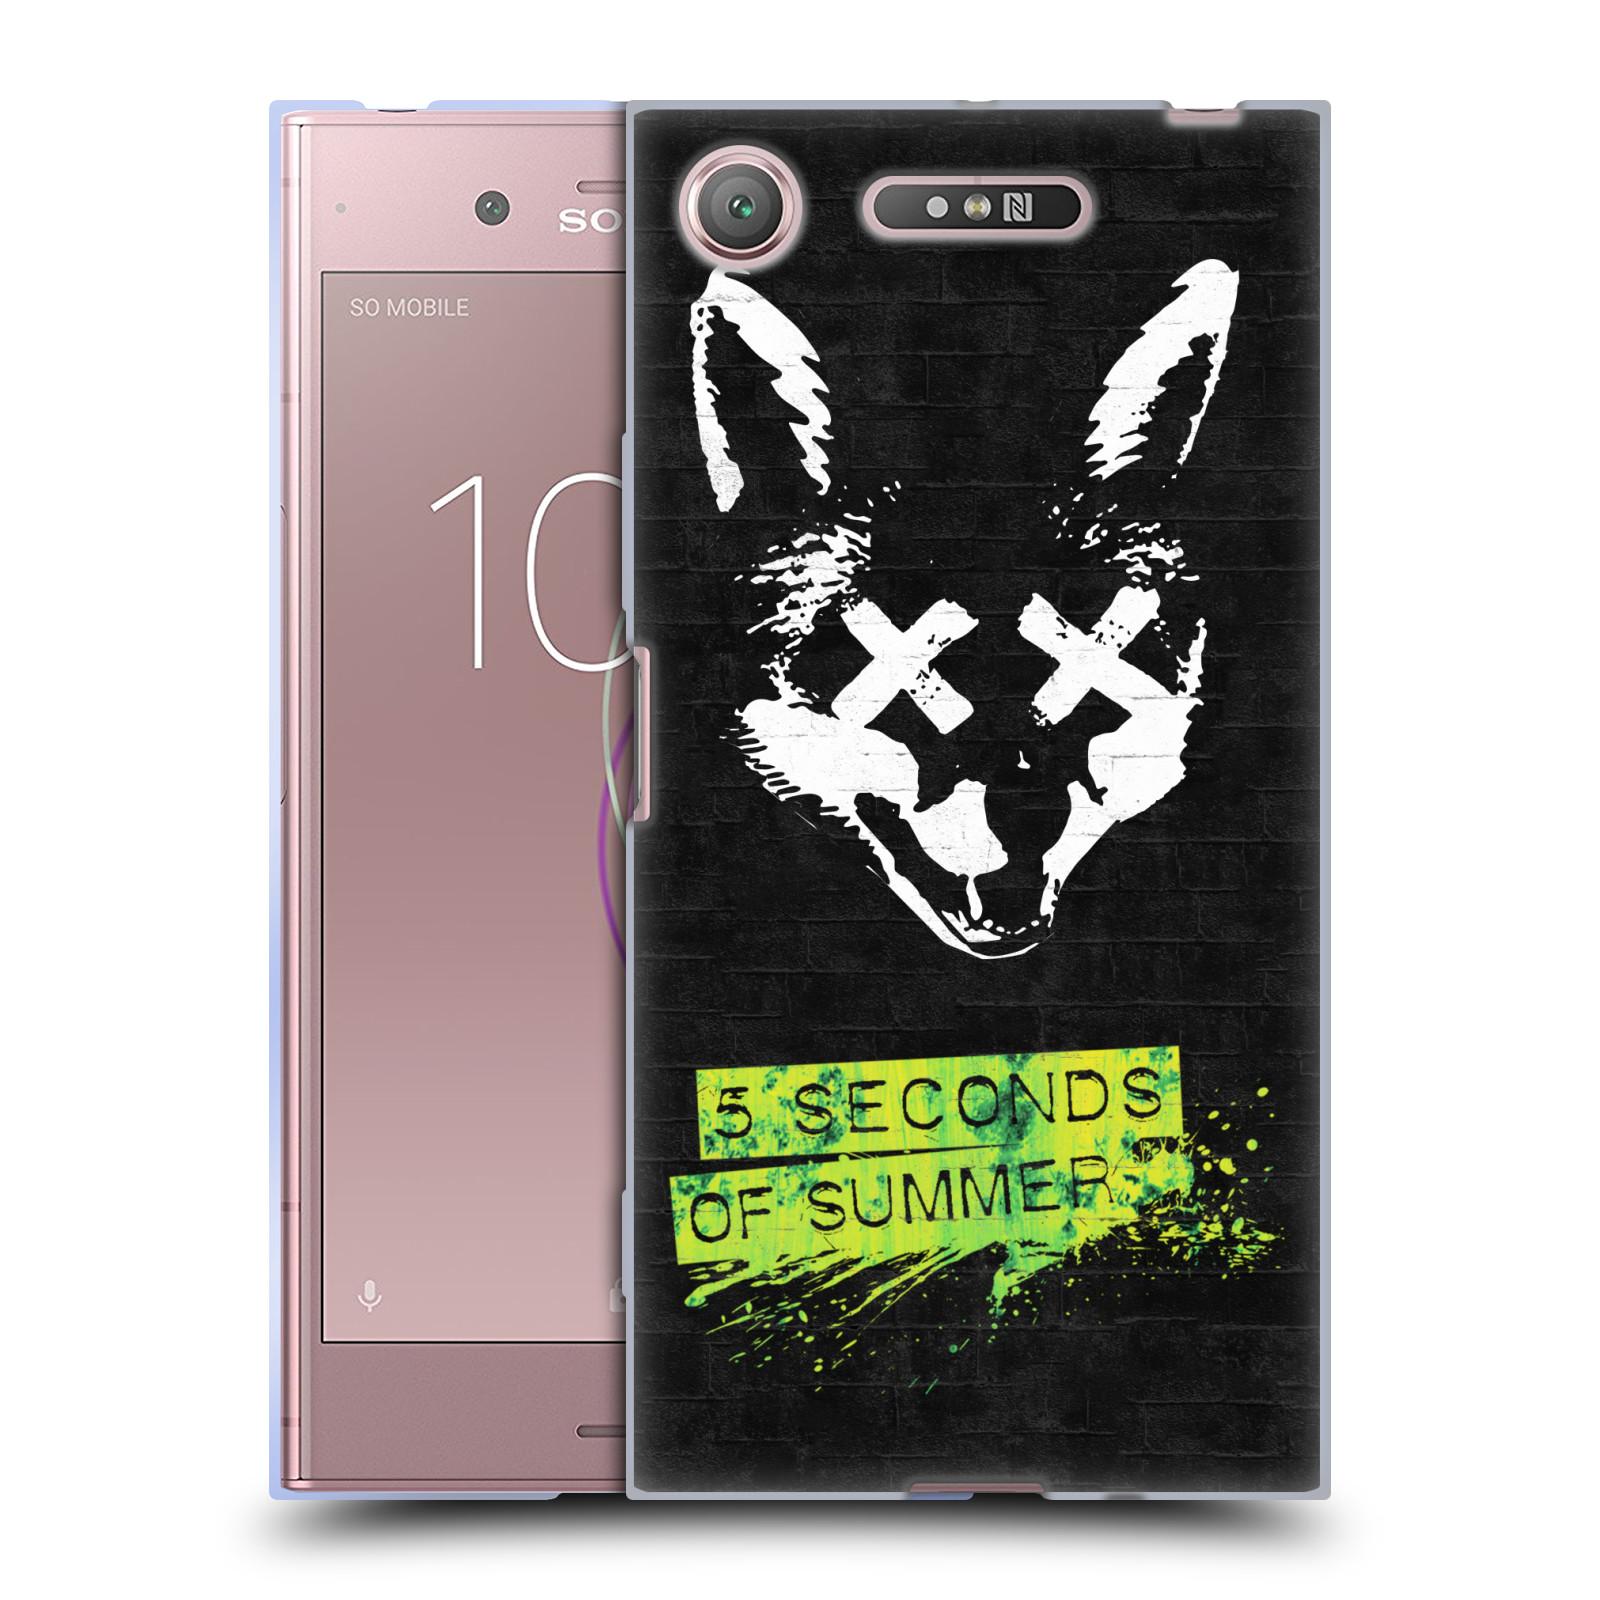 Silikonové pouzdro na mobil Sony Xperia XZ1 - Head Case - 5 Seconds of Summer - Fox